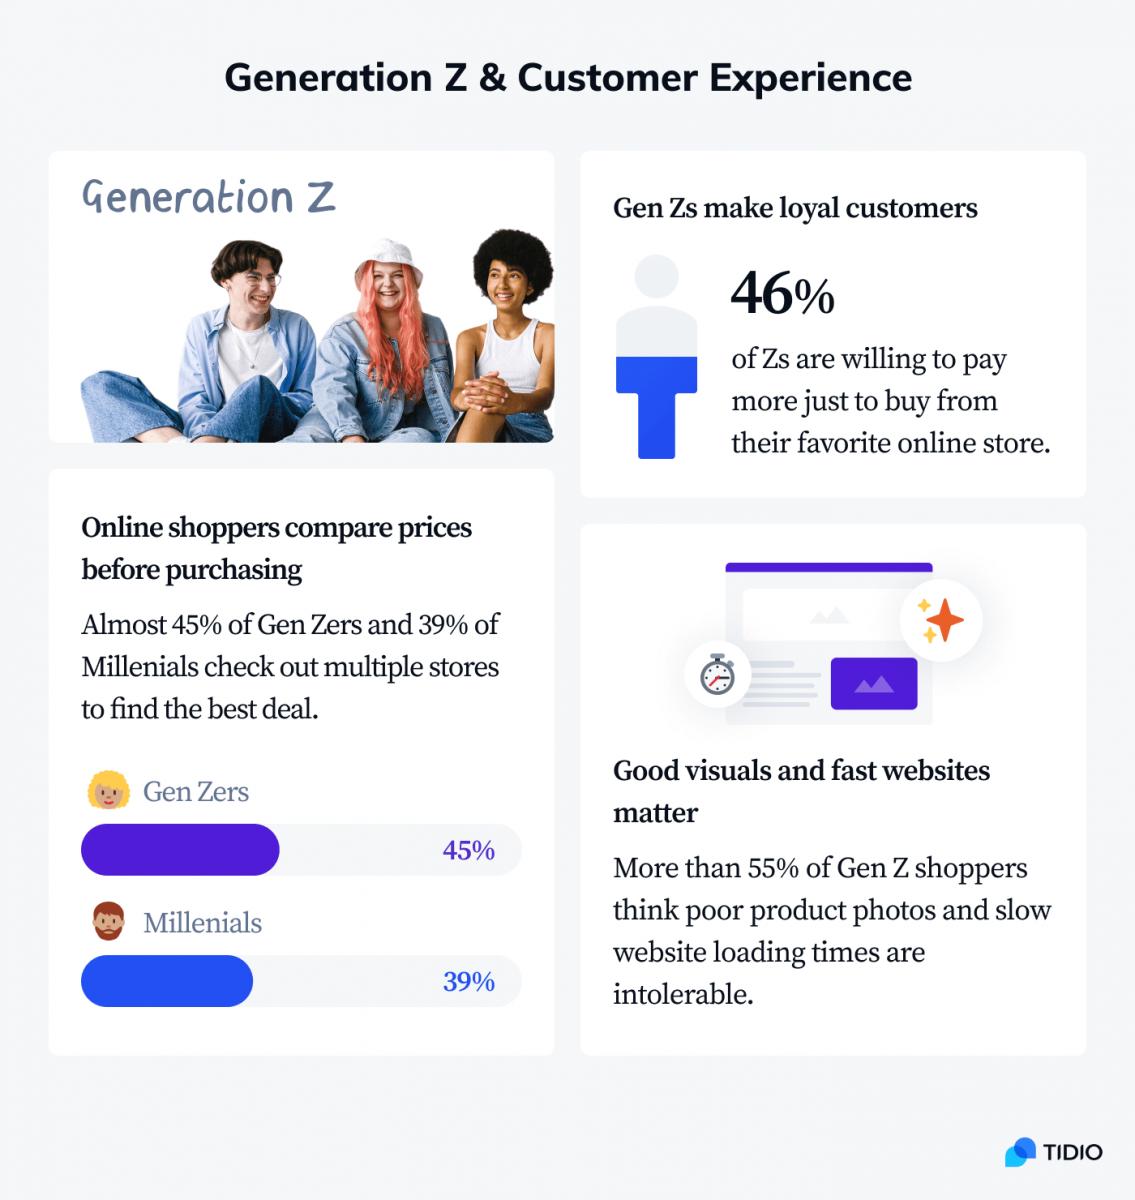 Generation Z & customer experience statistics